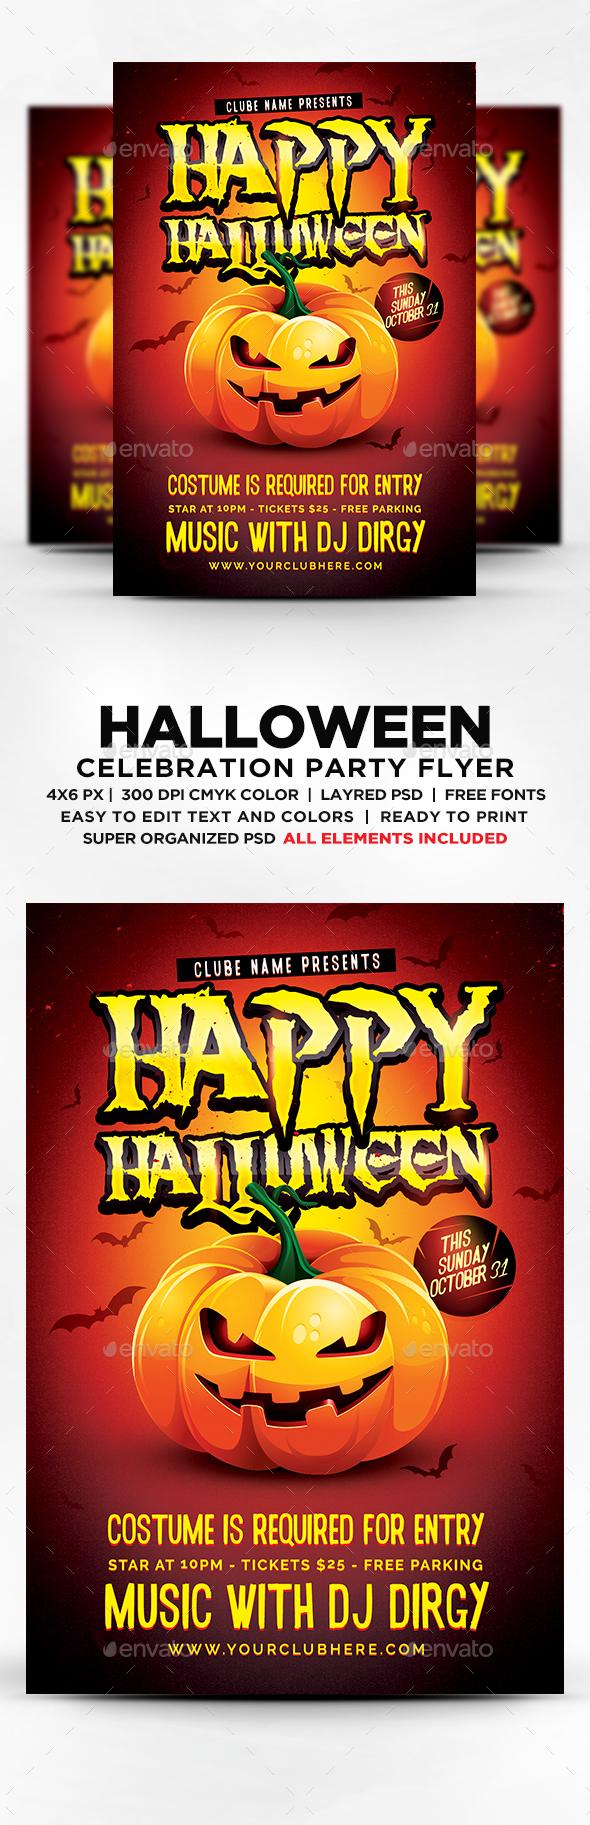 Happy Halloween Party Flyer